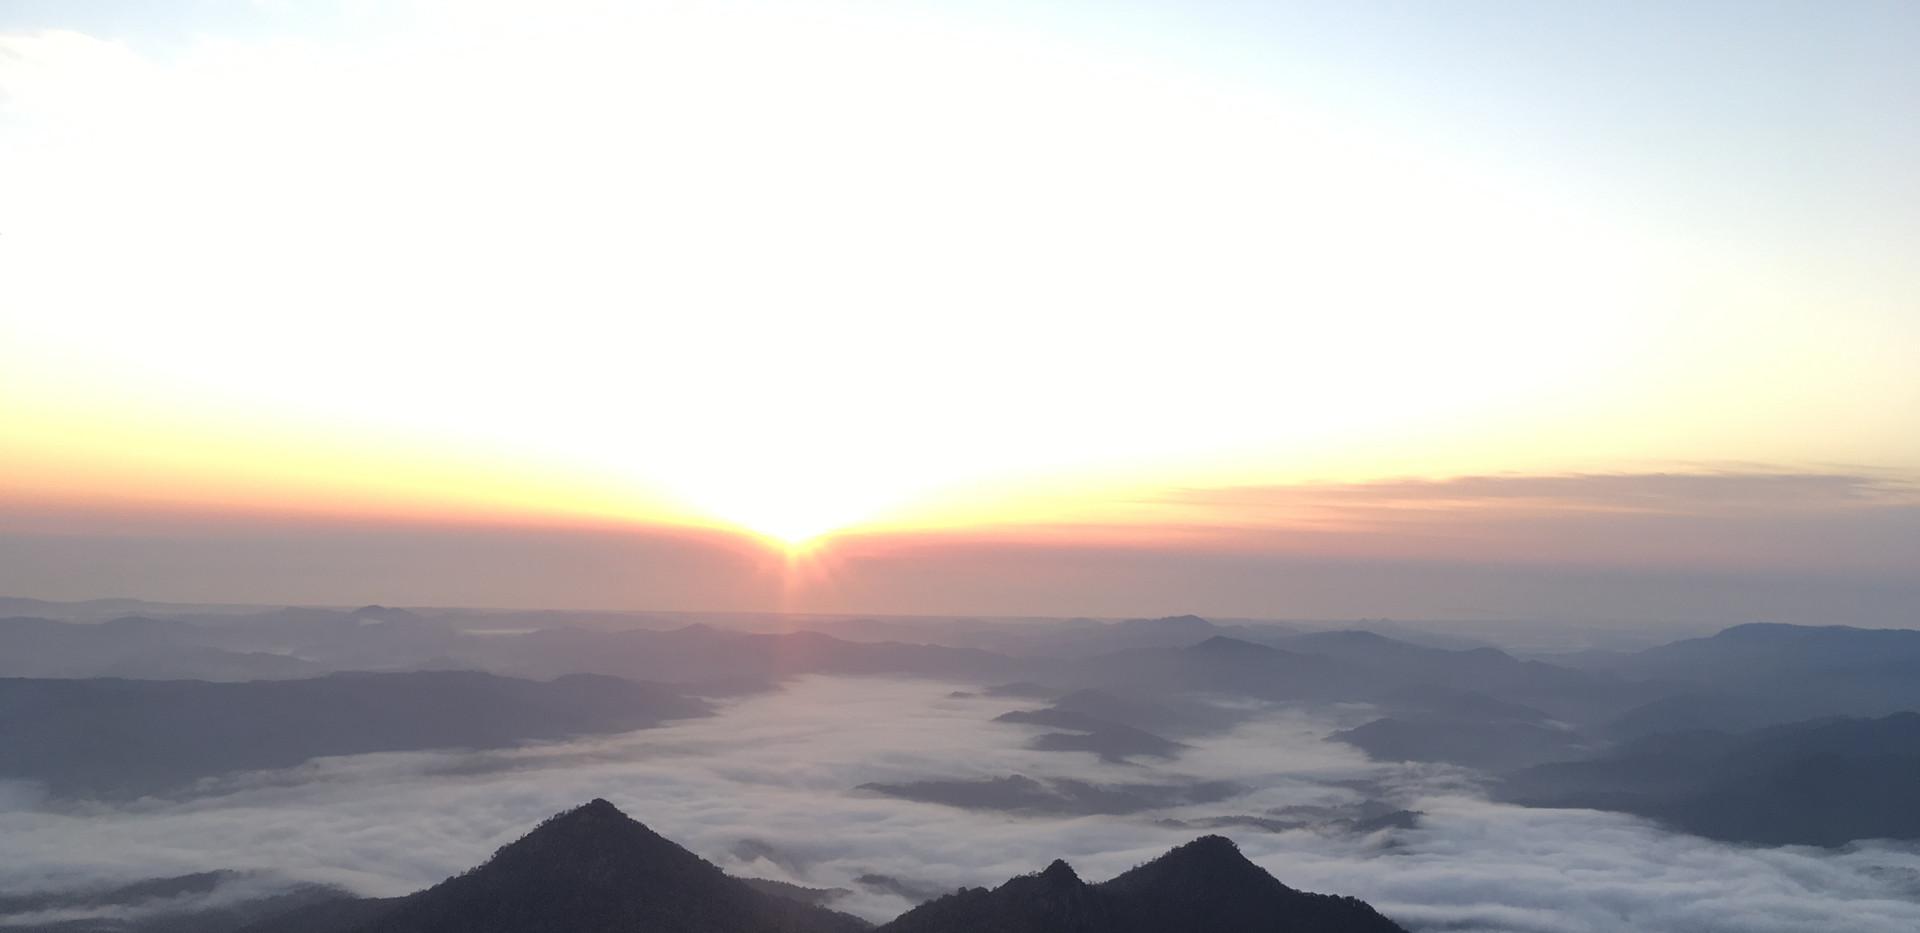 Getting the sunrise